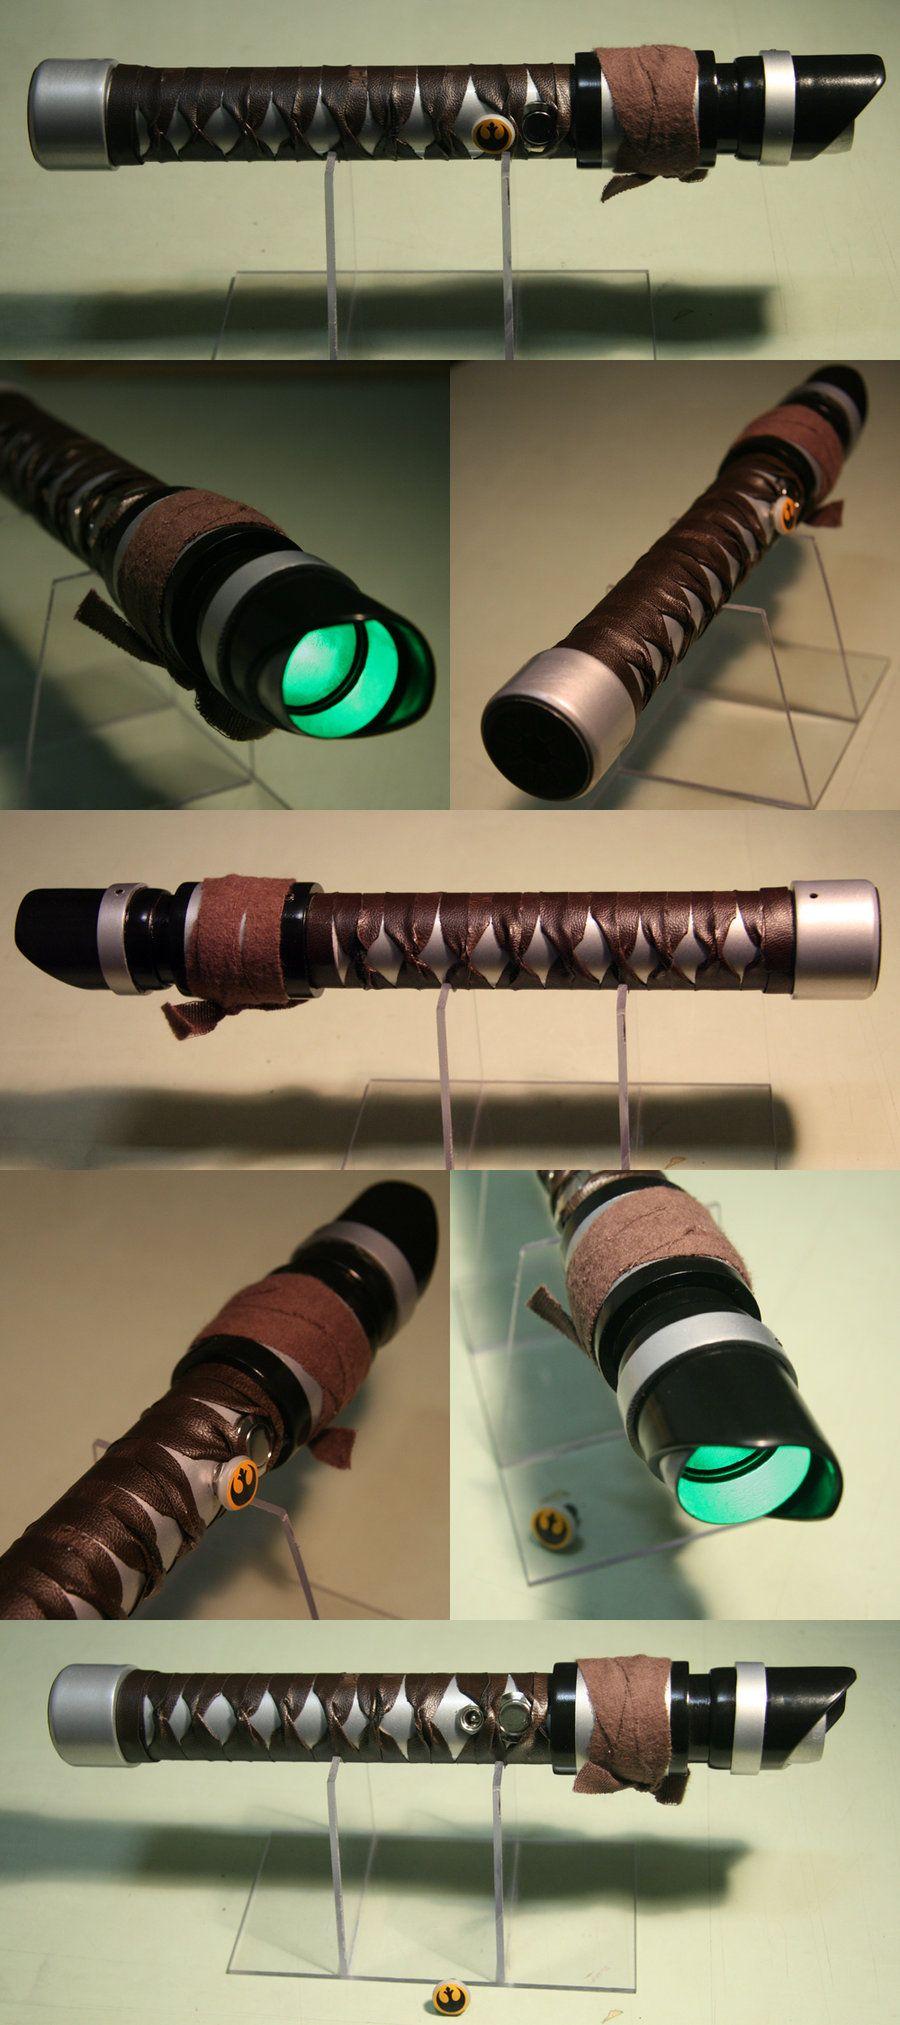 rahm kota pvc build saber modifications customs fx. Black Bedroom Furniture Sets. Home Design Ideas